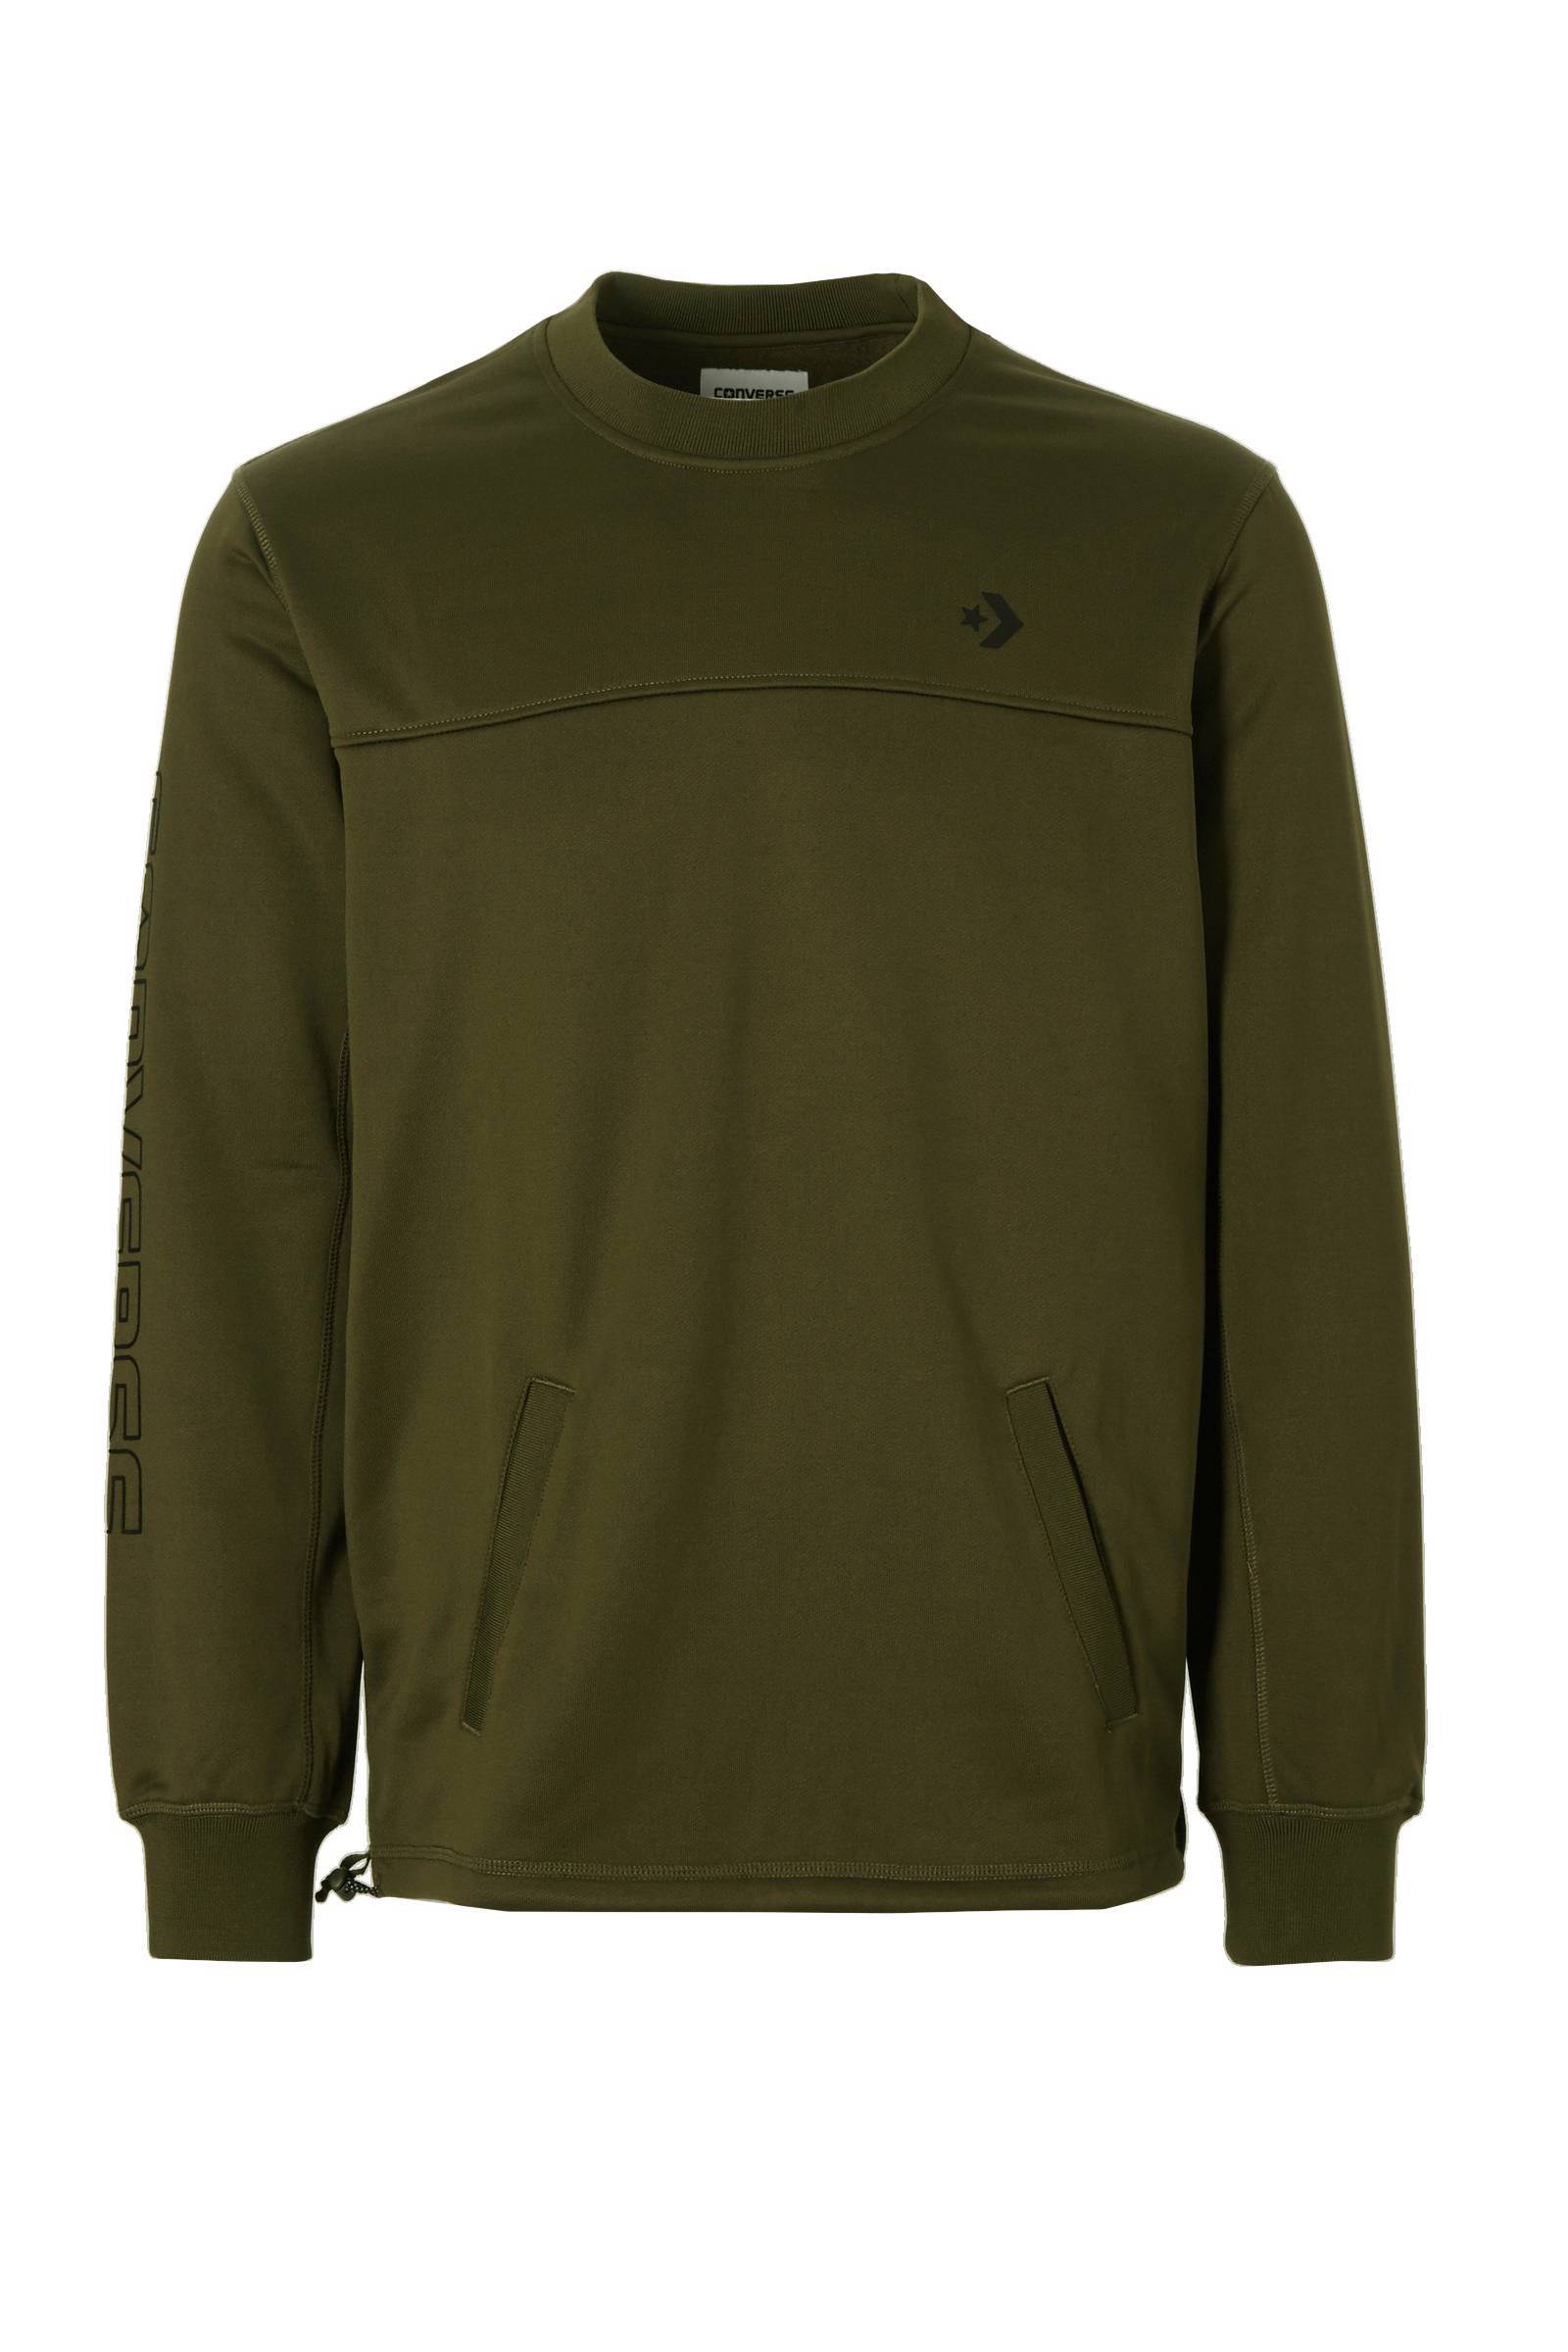 Converse sweater | wehkamp